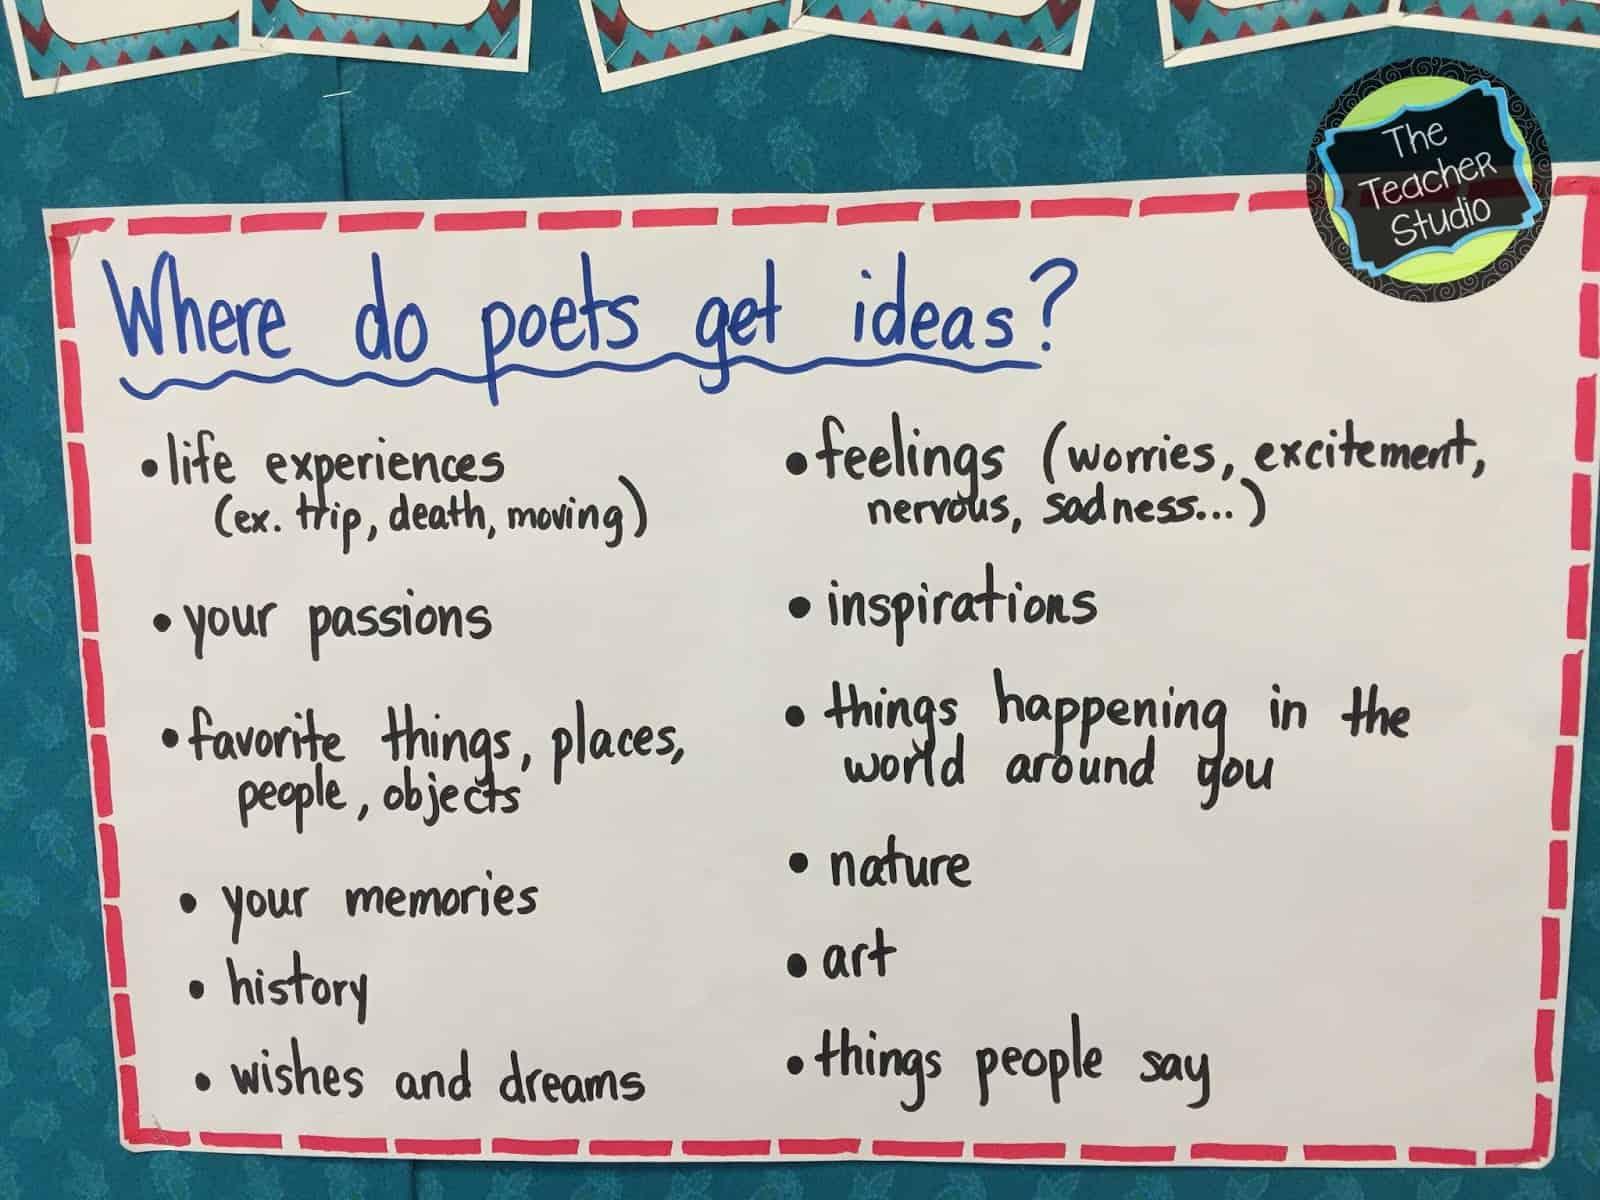 Kicking off our poetry studies    - The Teacher Studio